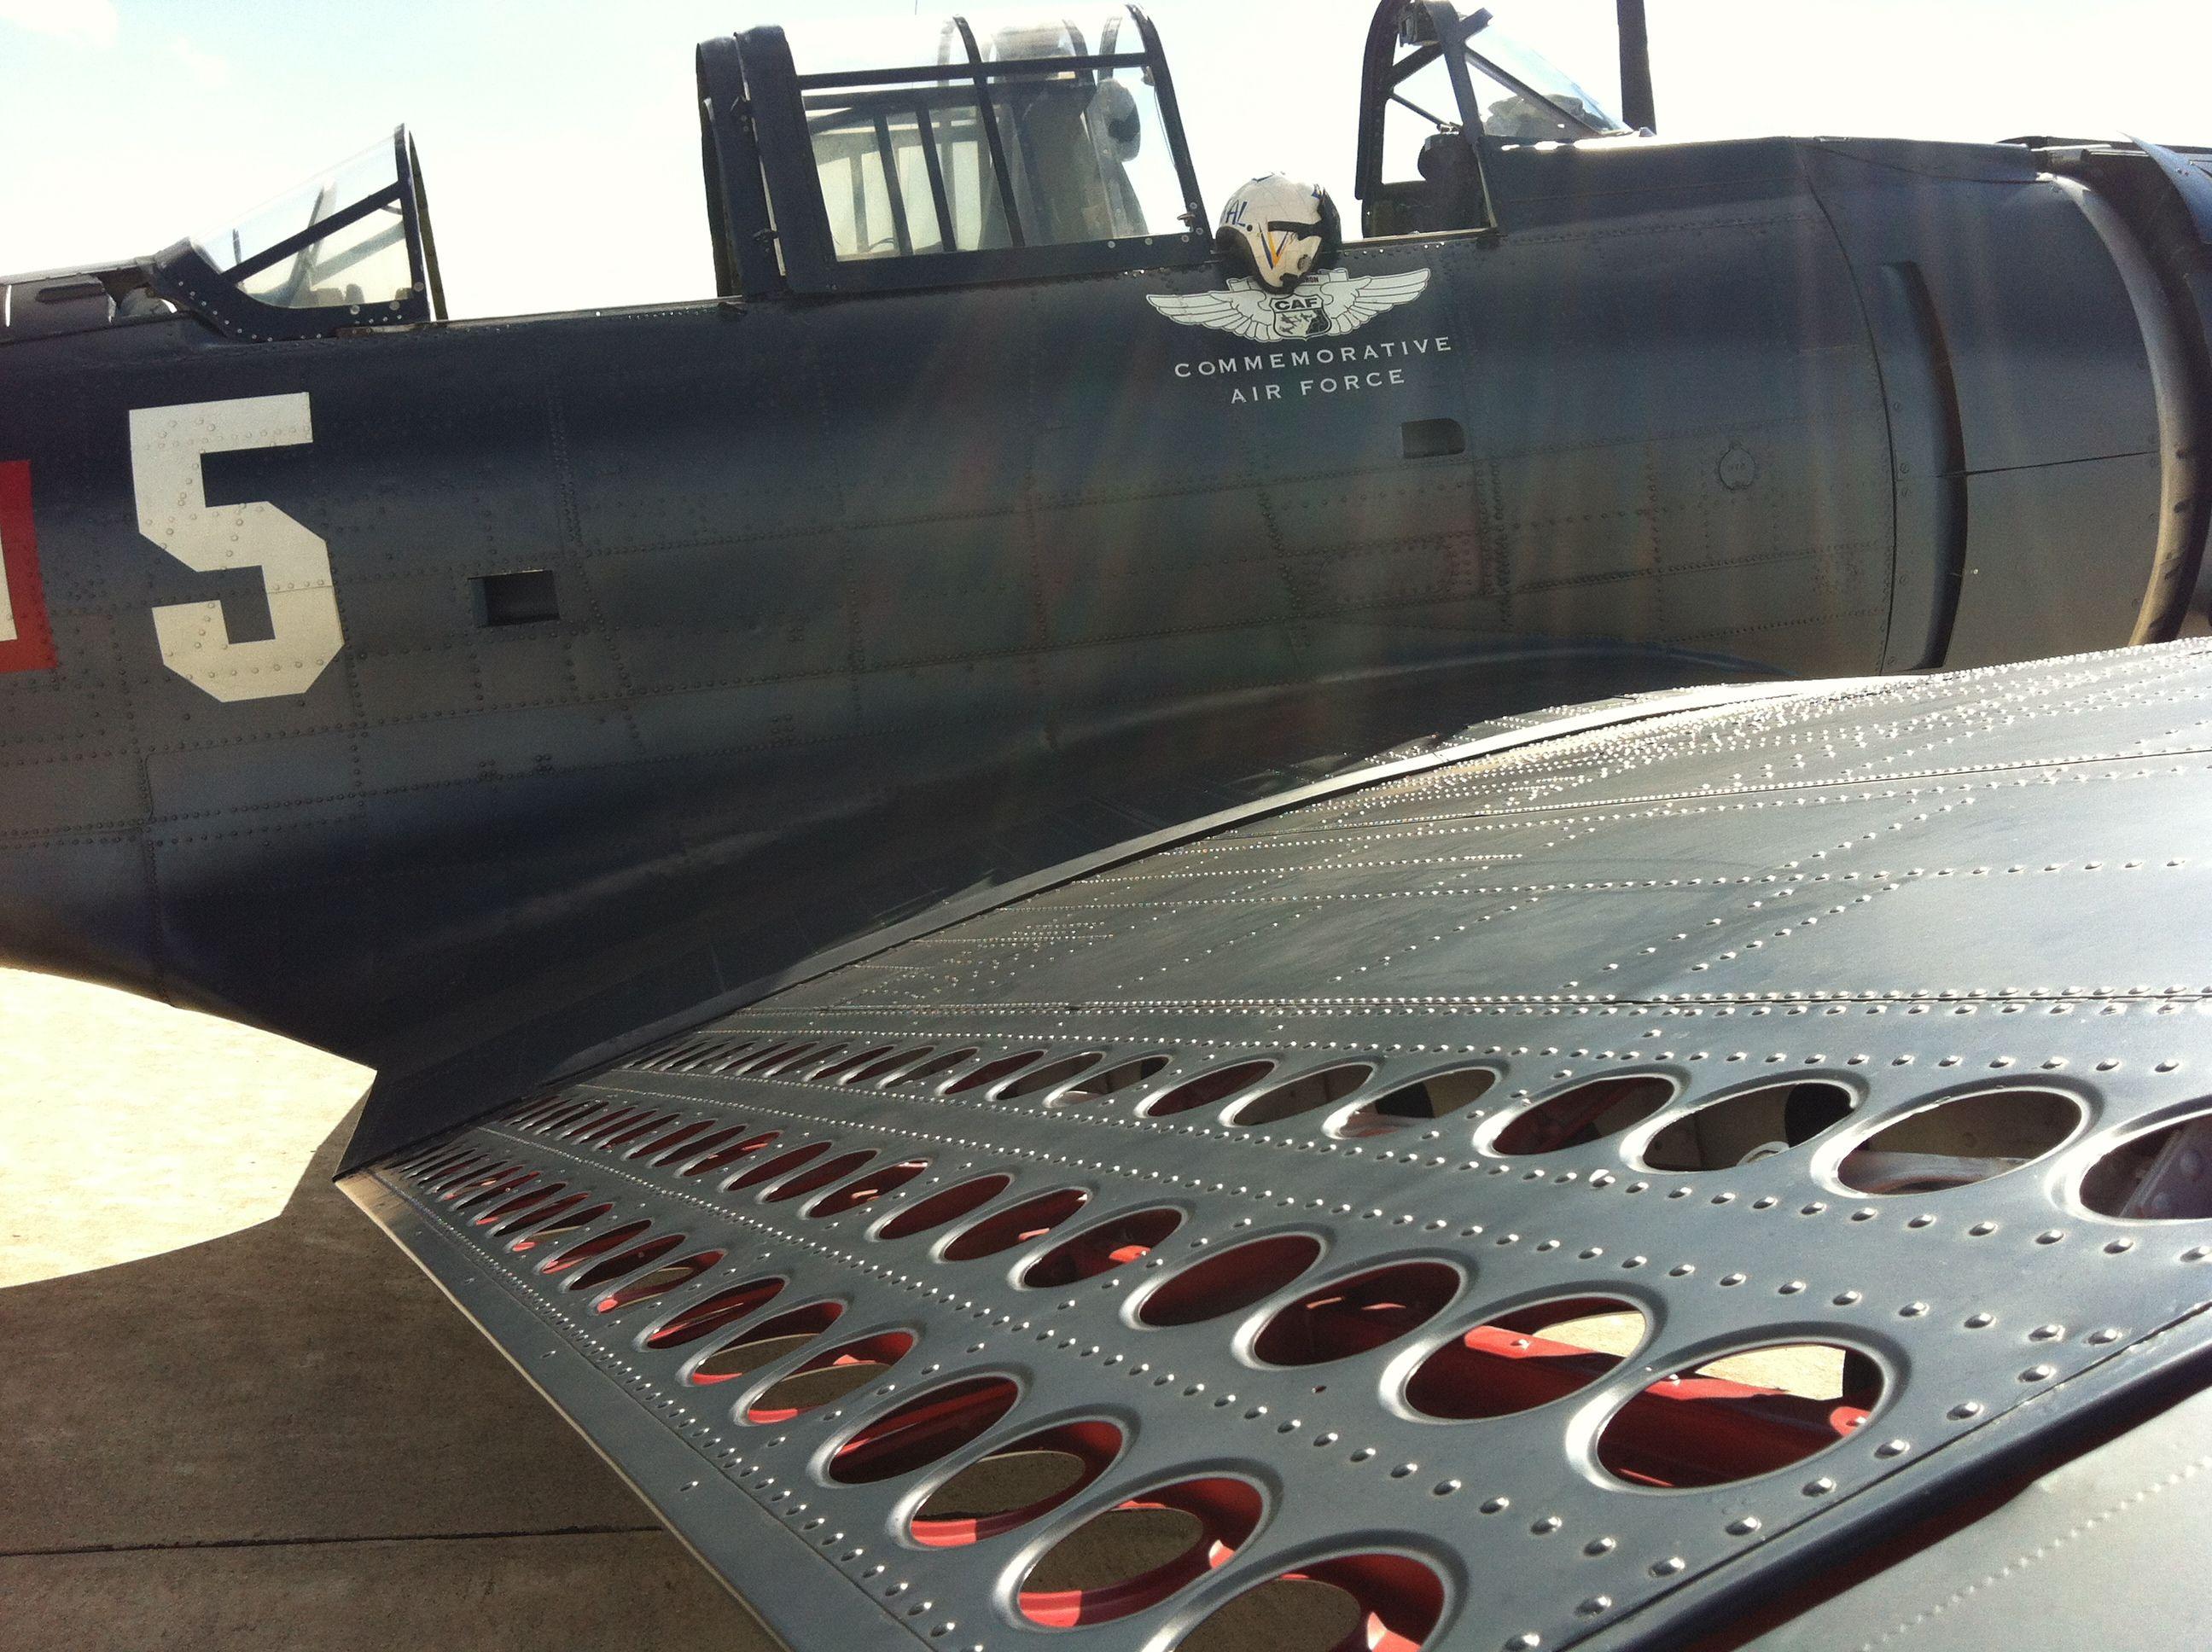 SBD Dauntless Divebomber. Belongs to the Commemorative